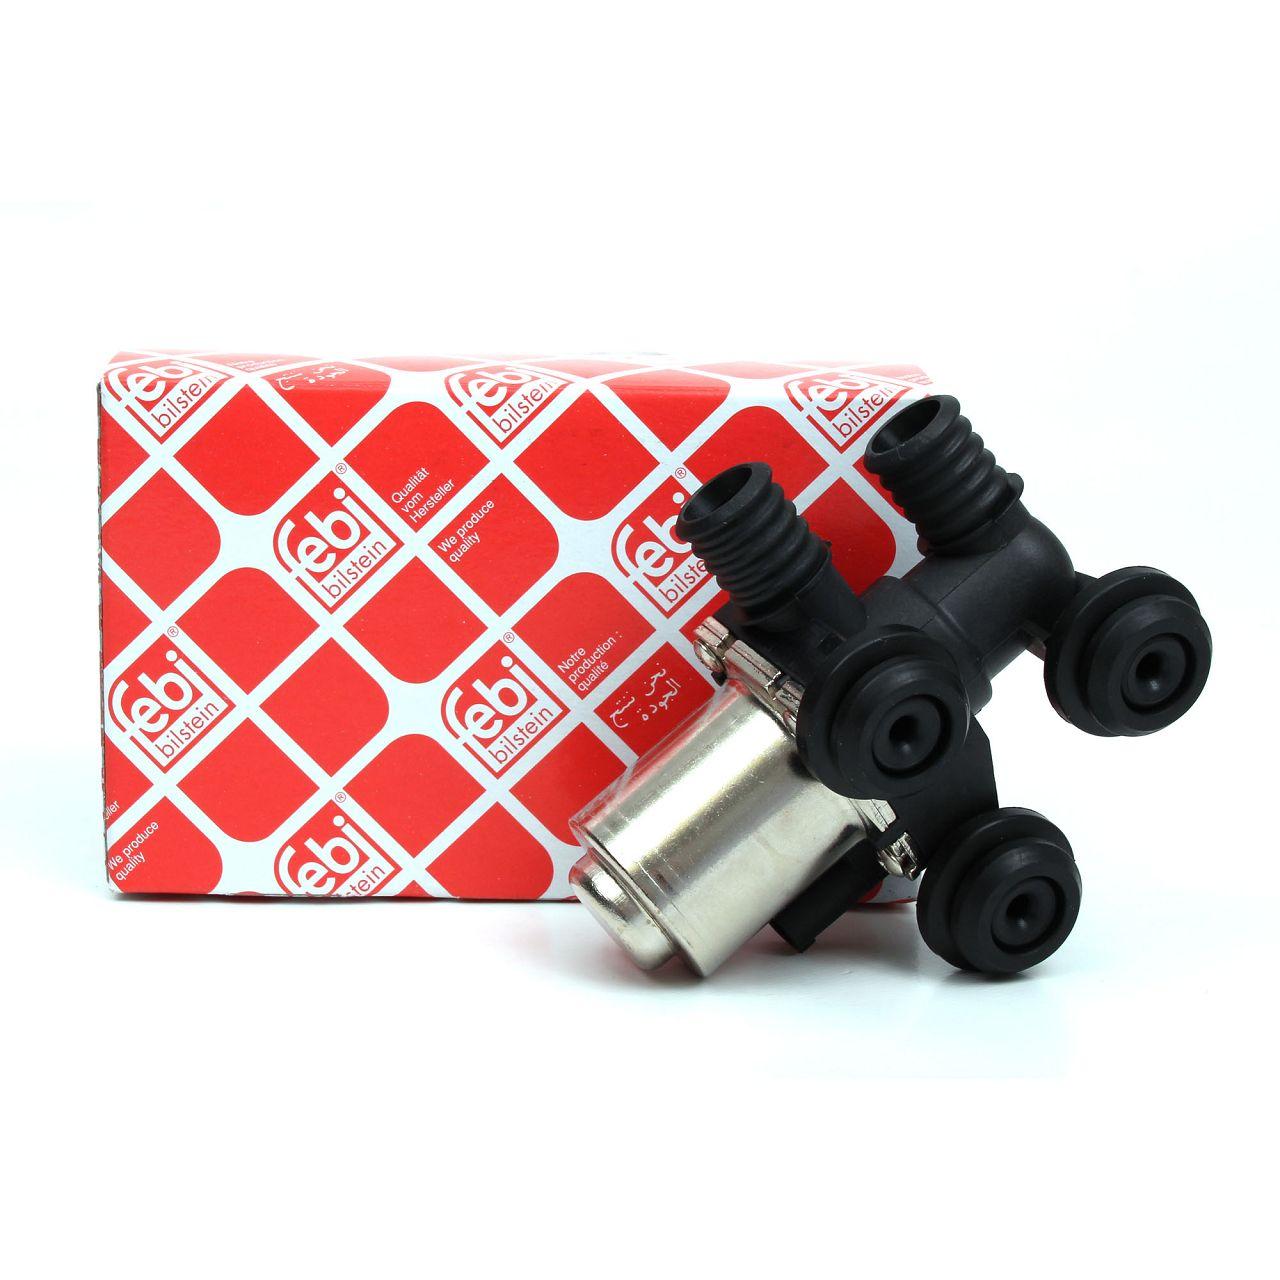 FEBI 46452 Heizungsventil Kühlmittelregelventil Regelventil für BMW E46 E39 E53